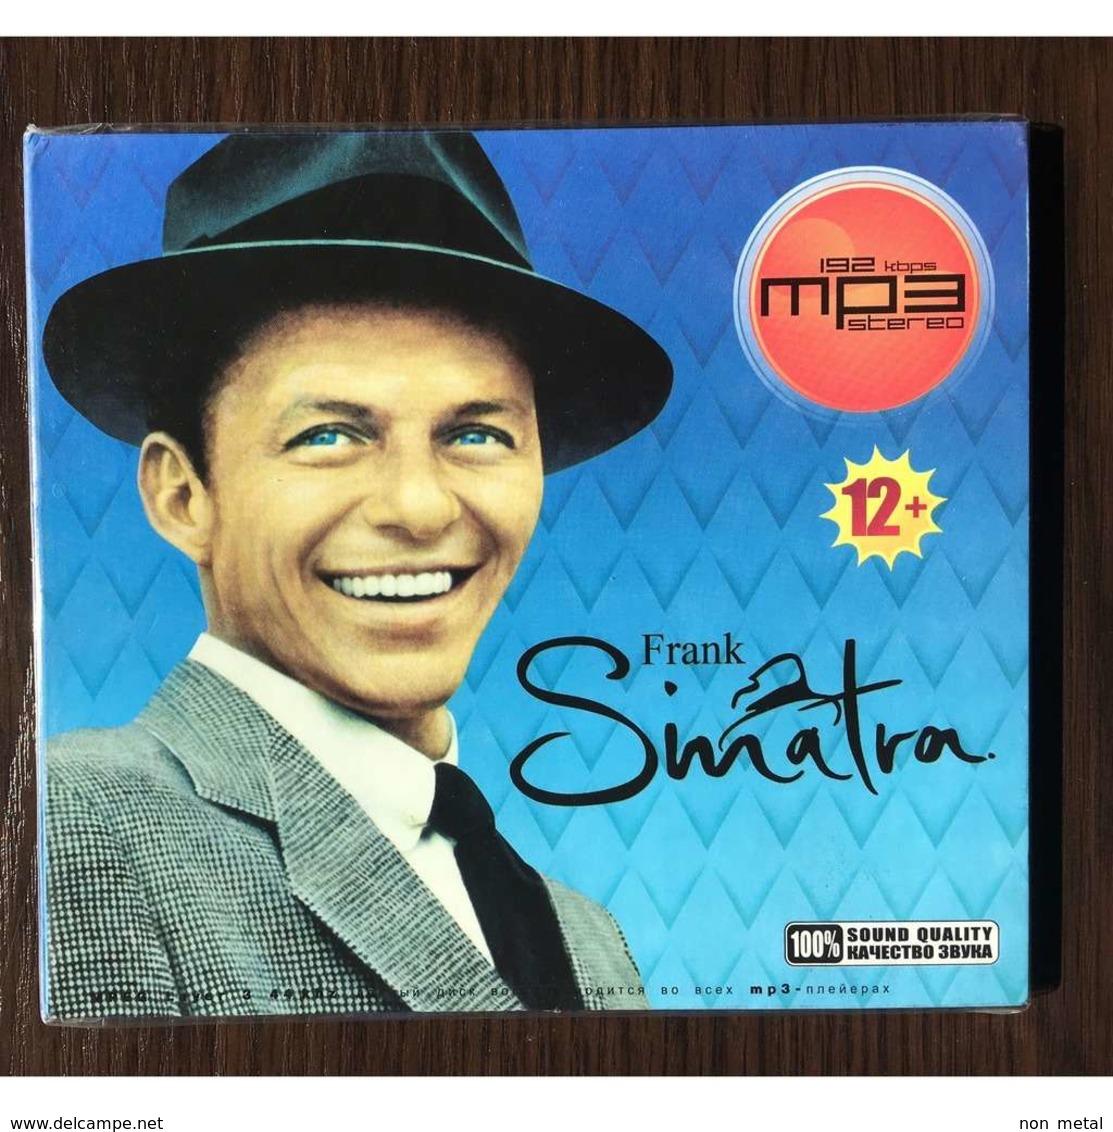 Frаnk Sinatrа: MP3 Collection 171 Tracks (M-Center Rec) Rus - Disco, Pop